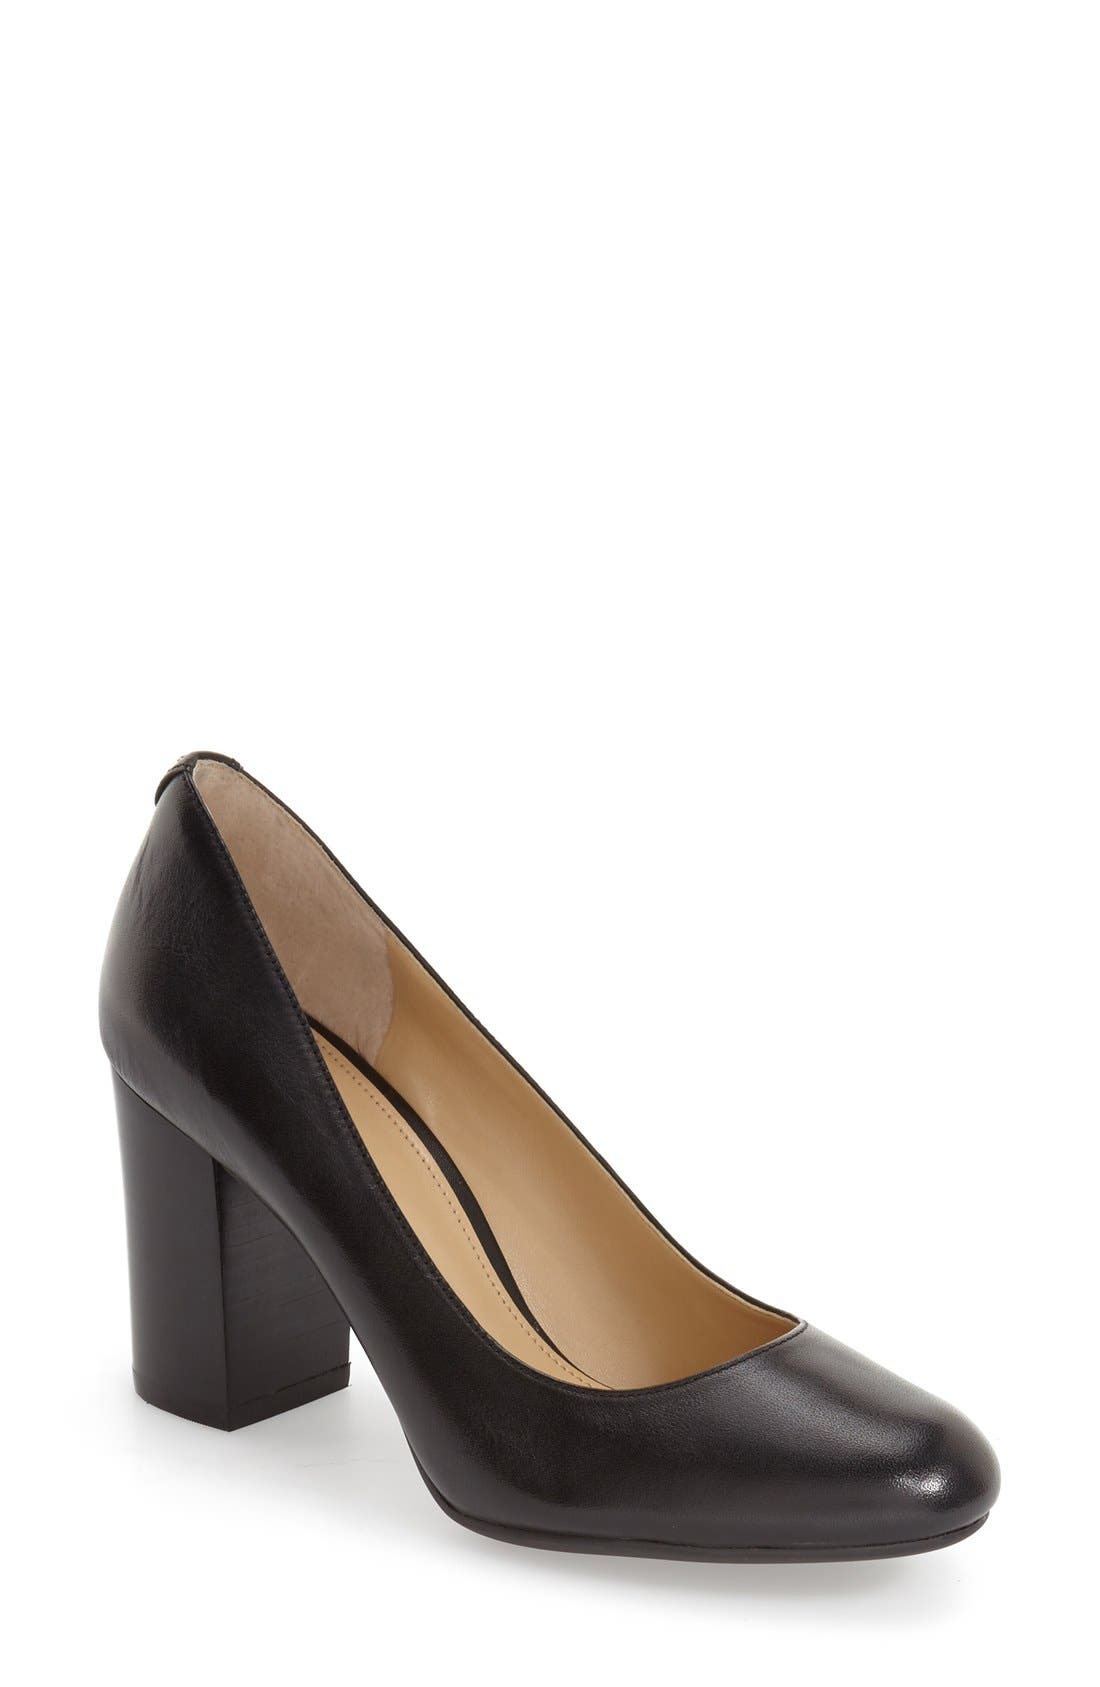 'Lucy - Flex' Round Toe Pump,                         Main,                         color, Black Leather